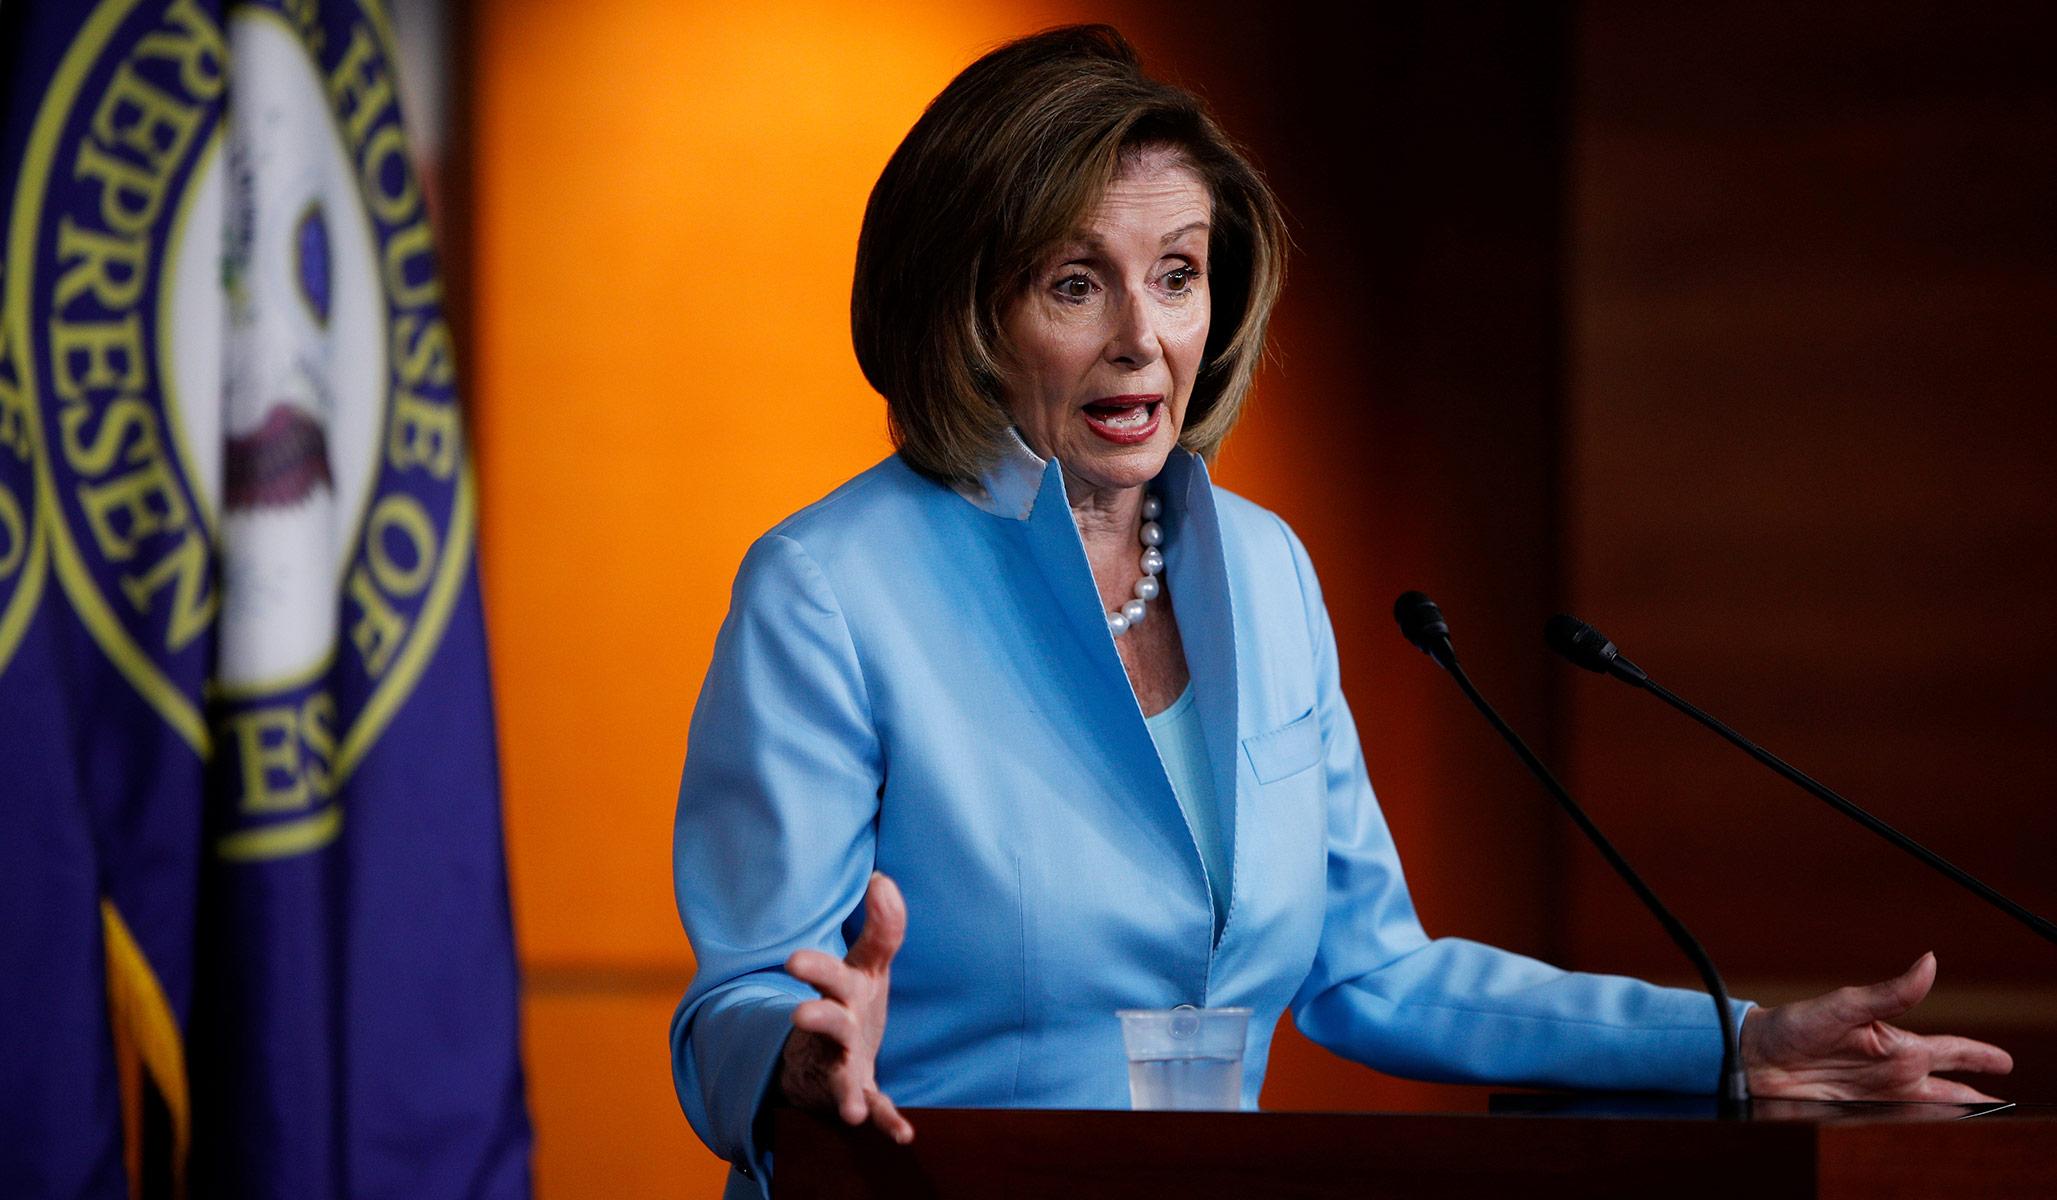 Pelosi: 'Seems Self-Evident' Reconciliation Bill Will Be Less Than $3.5 Trillion